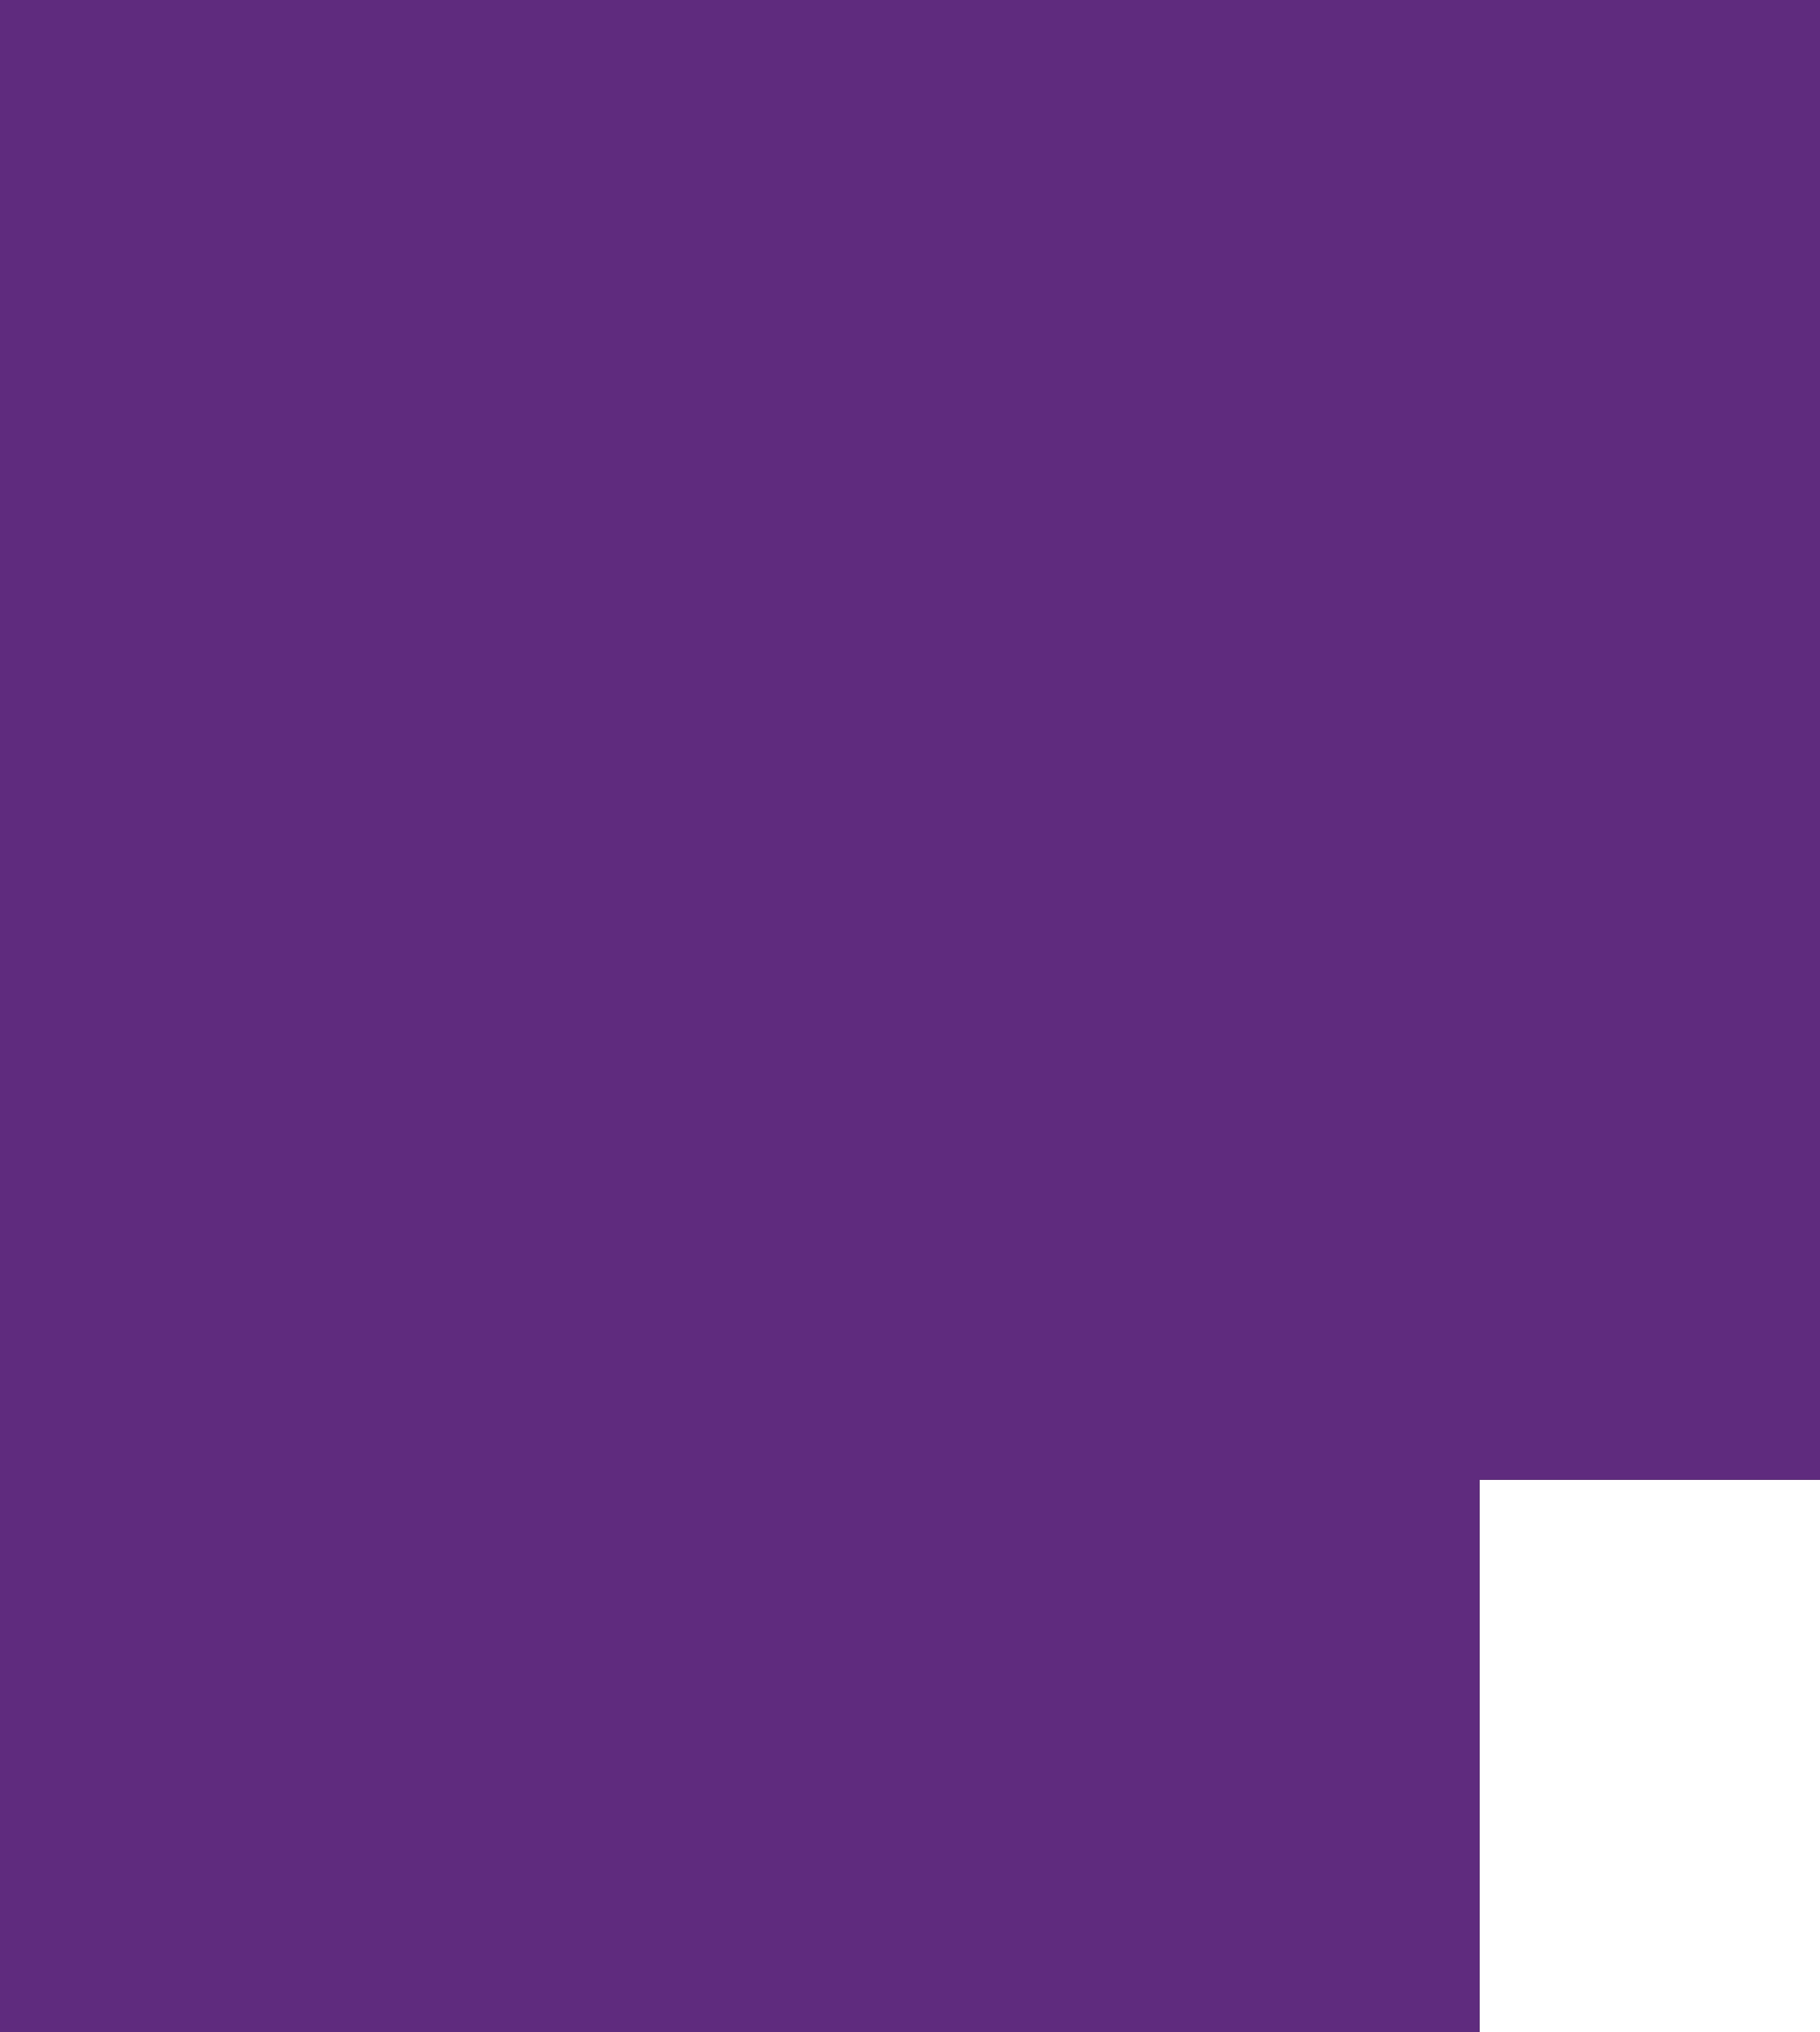 heor-left-shape-v2 paars